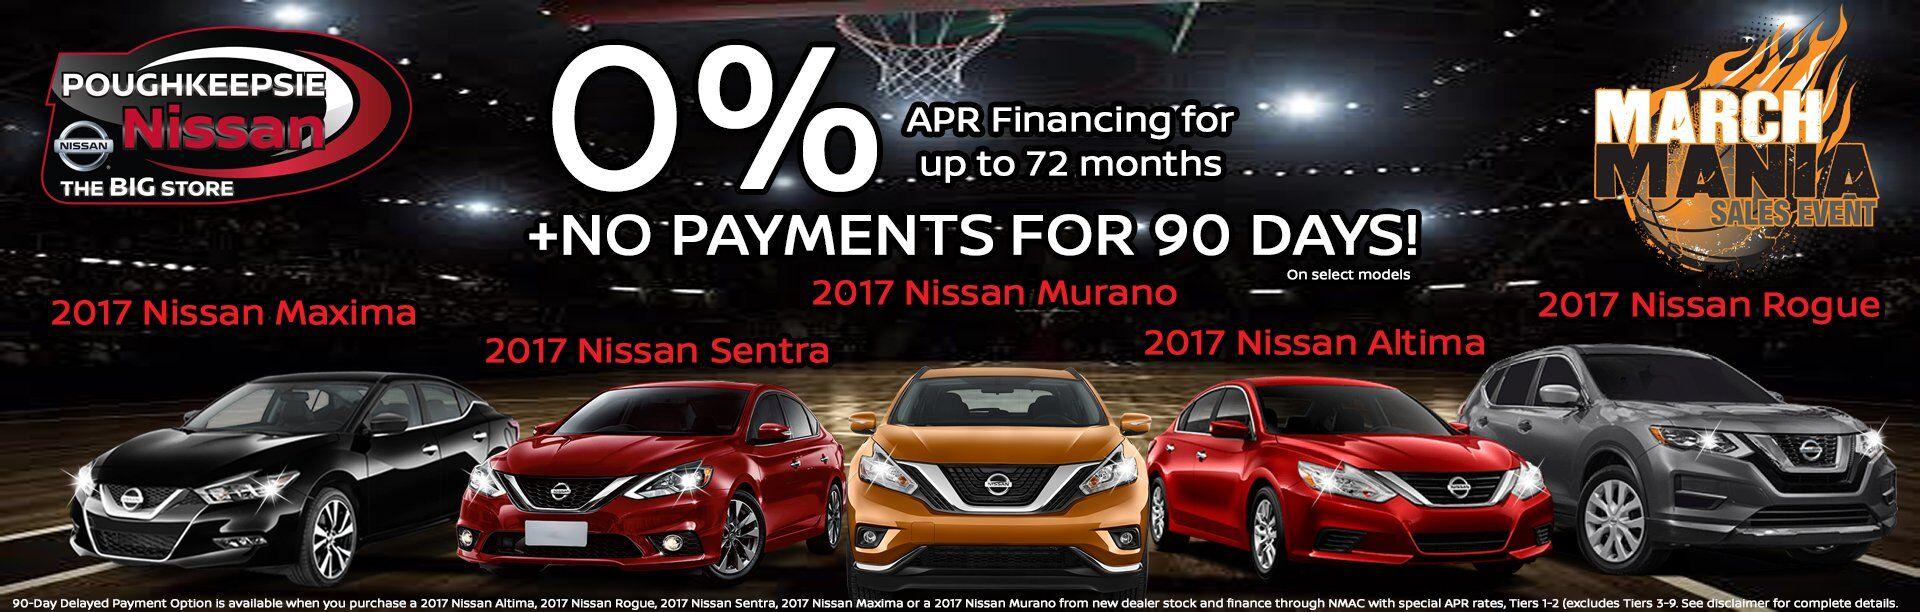 Nissan Dealership Wappingers Falls NY Used Cars ...